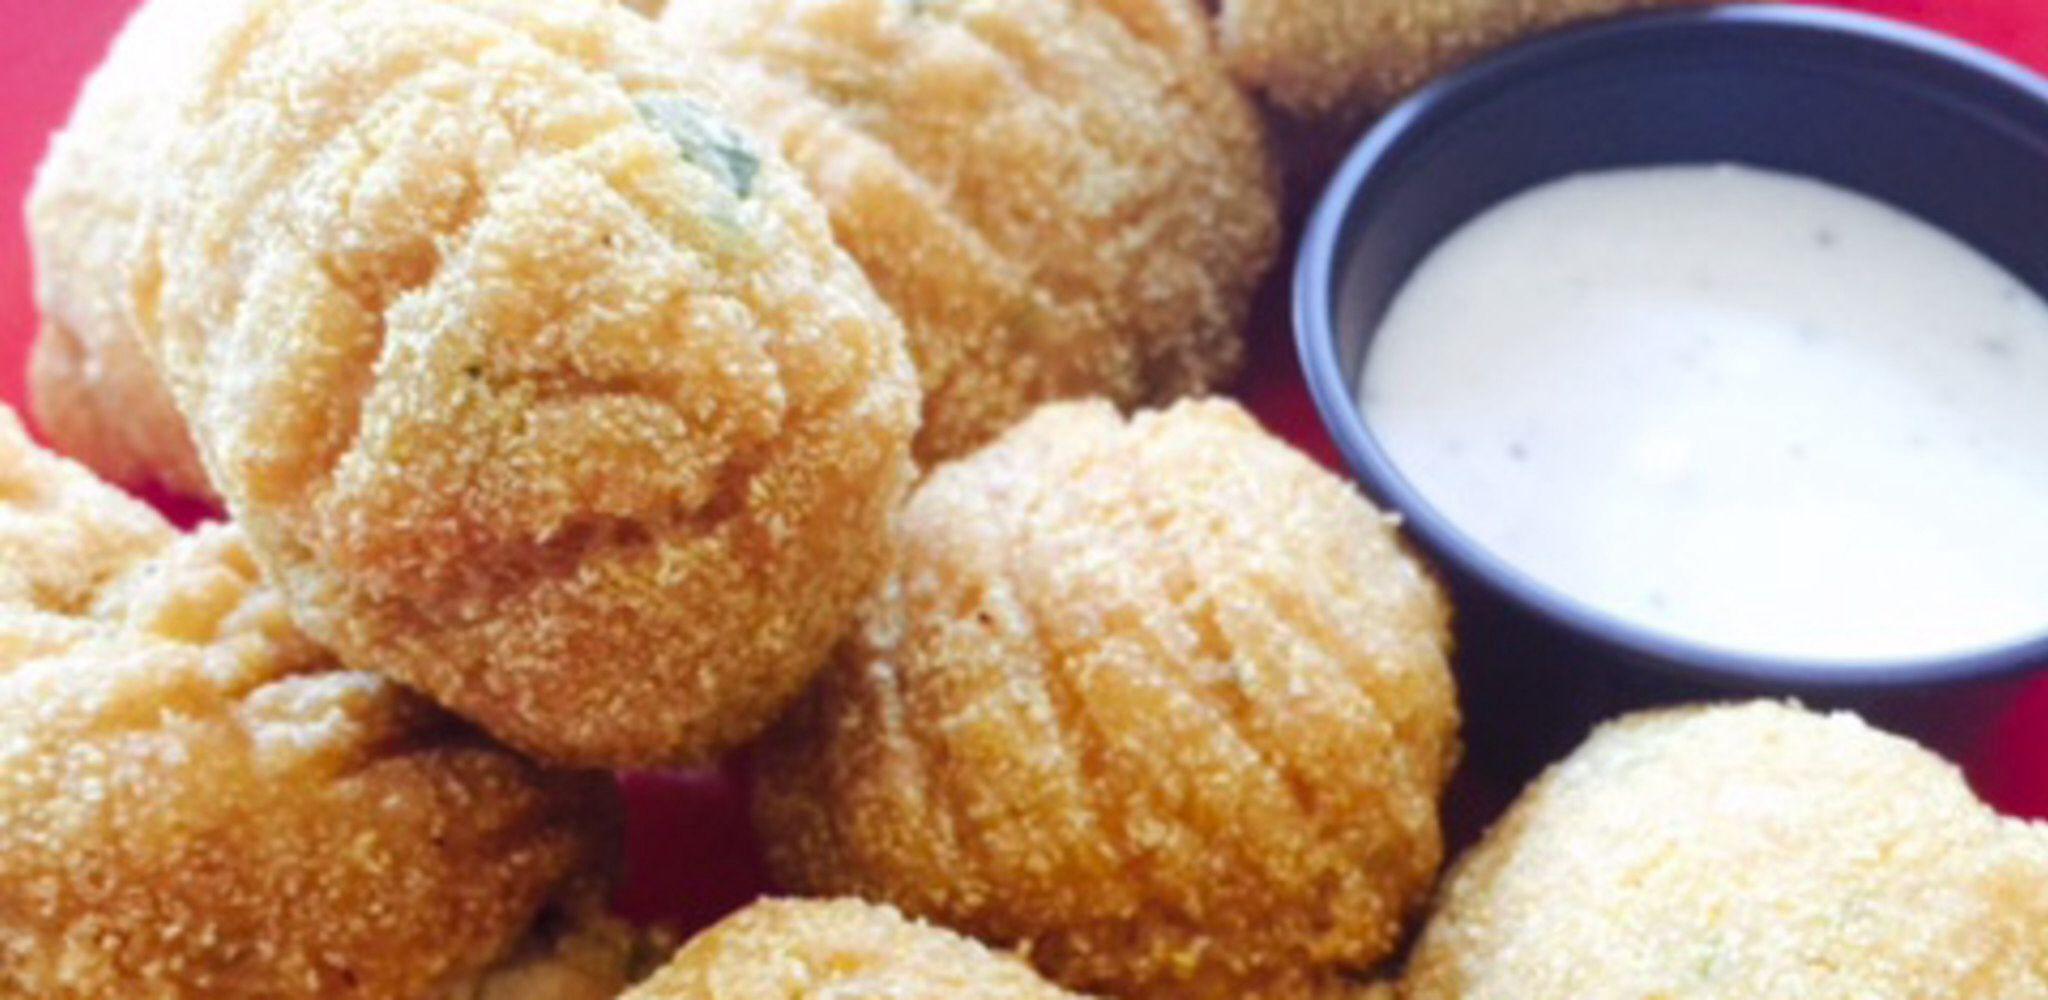 GlutenFree Vegan Creole Jalapeno Hush Puppies Recipe